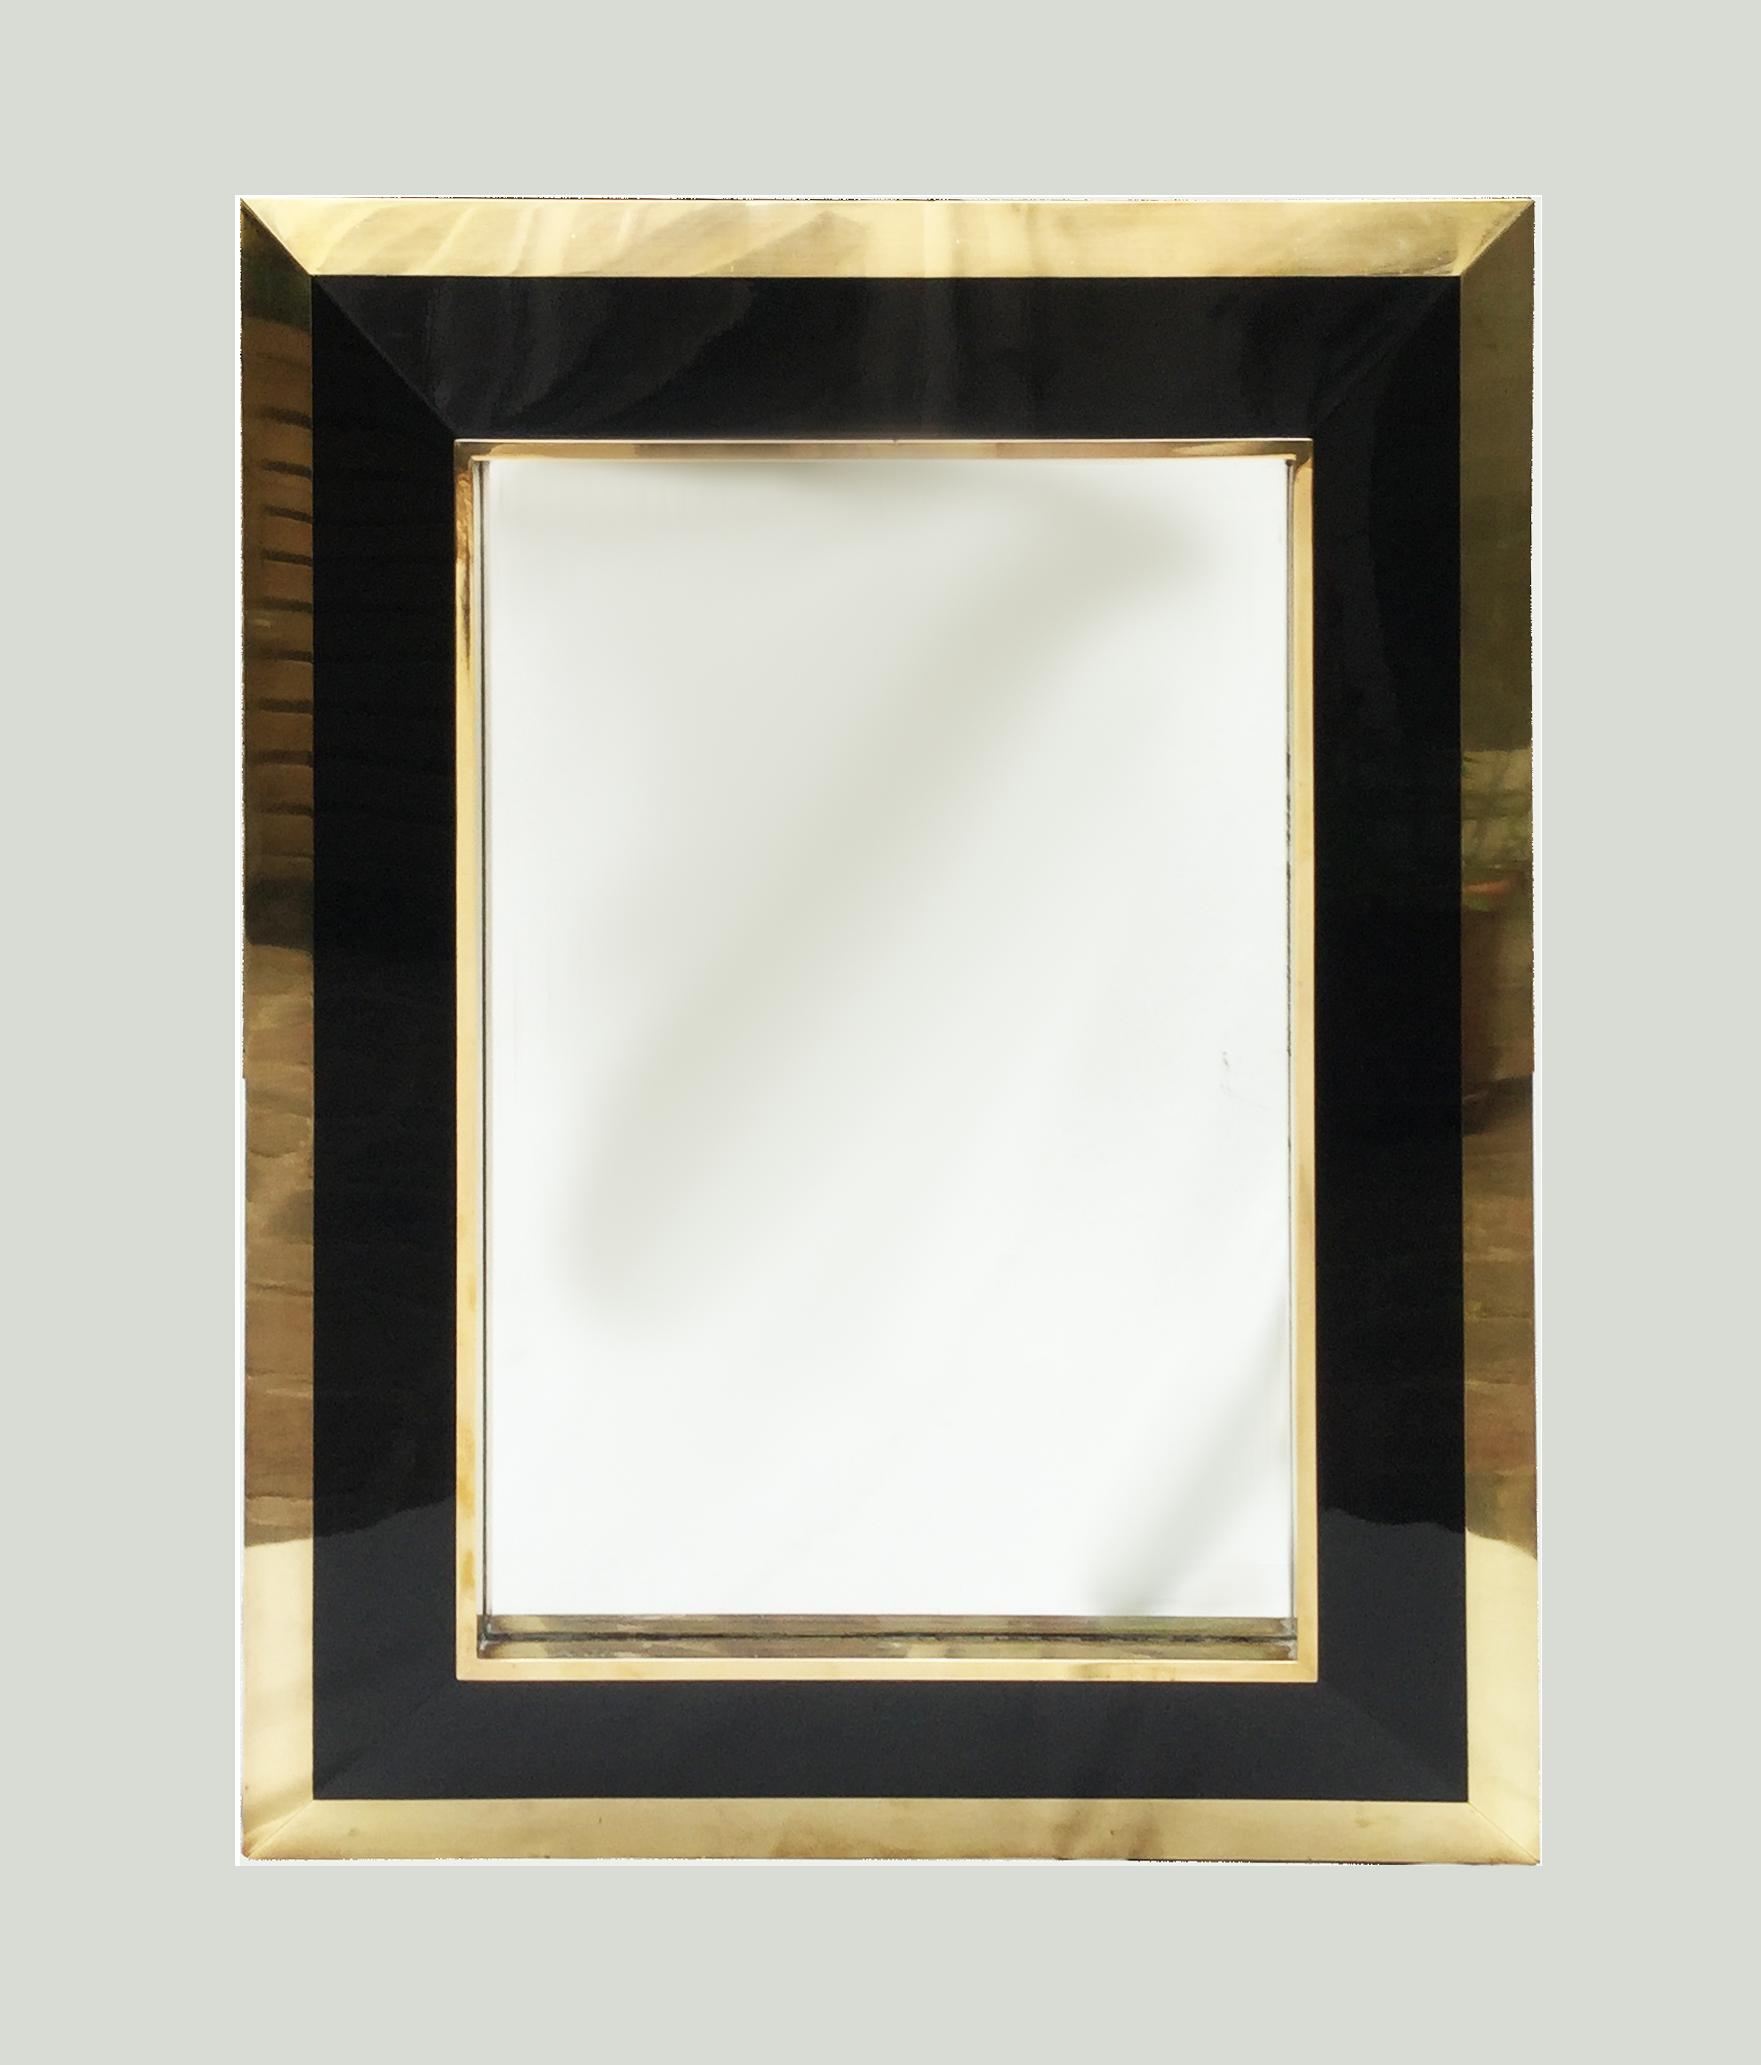 Miroir j c mahey galerie yvan royer for Miroir xviii